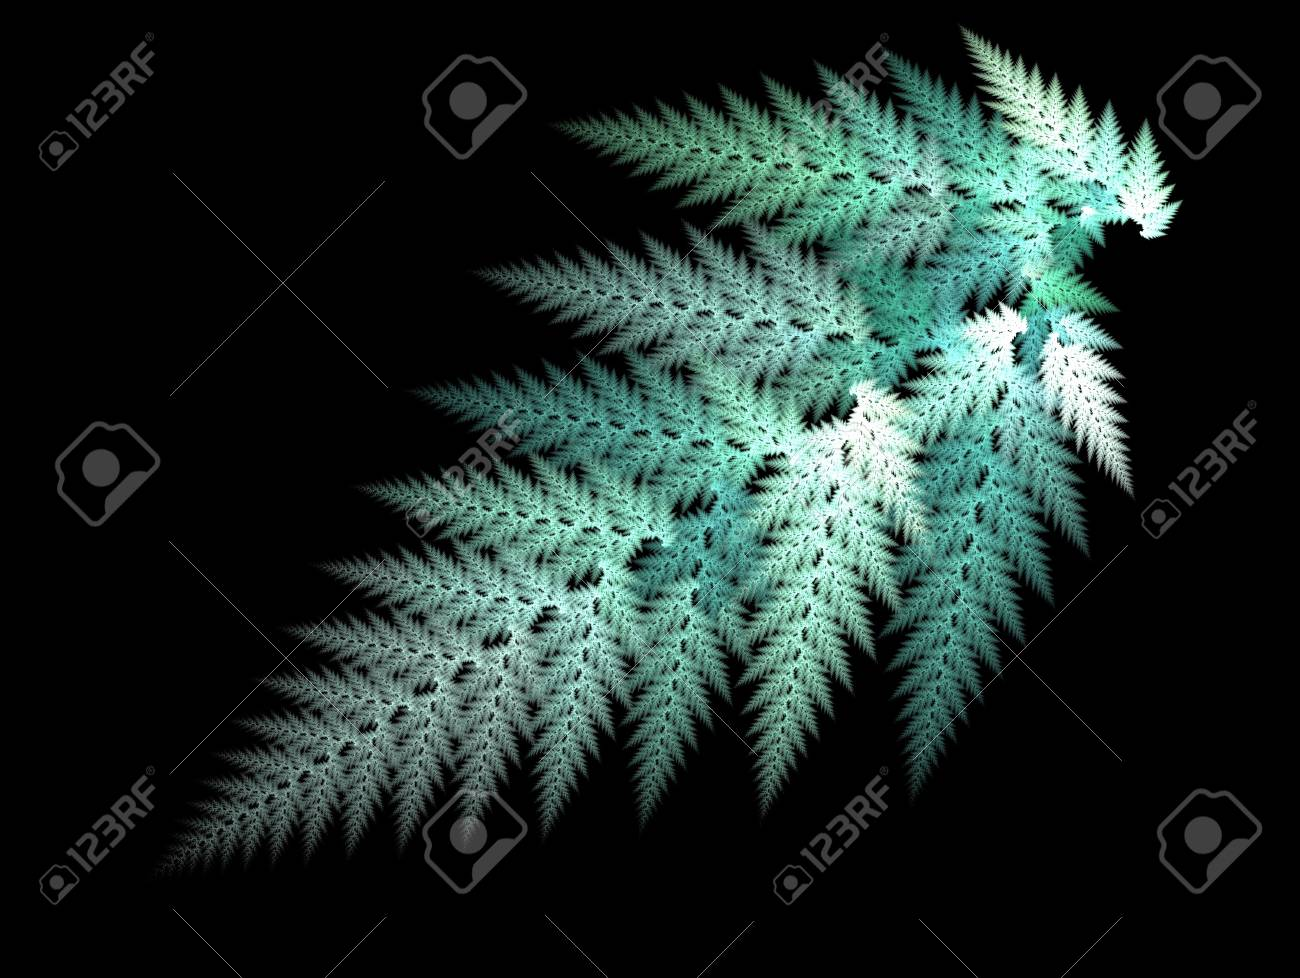 Fractal Illustration background. Abstract graphic. Rendered image. Stock Illustration - 18360581